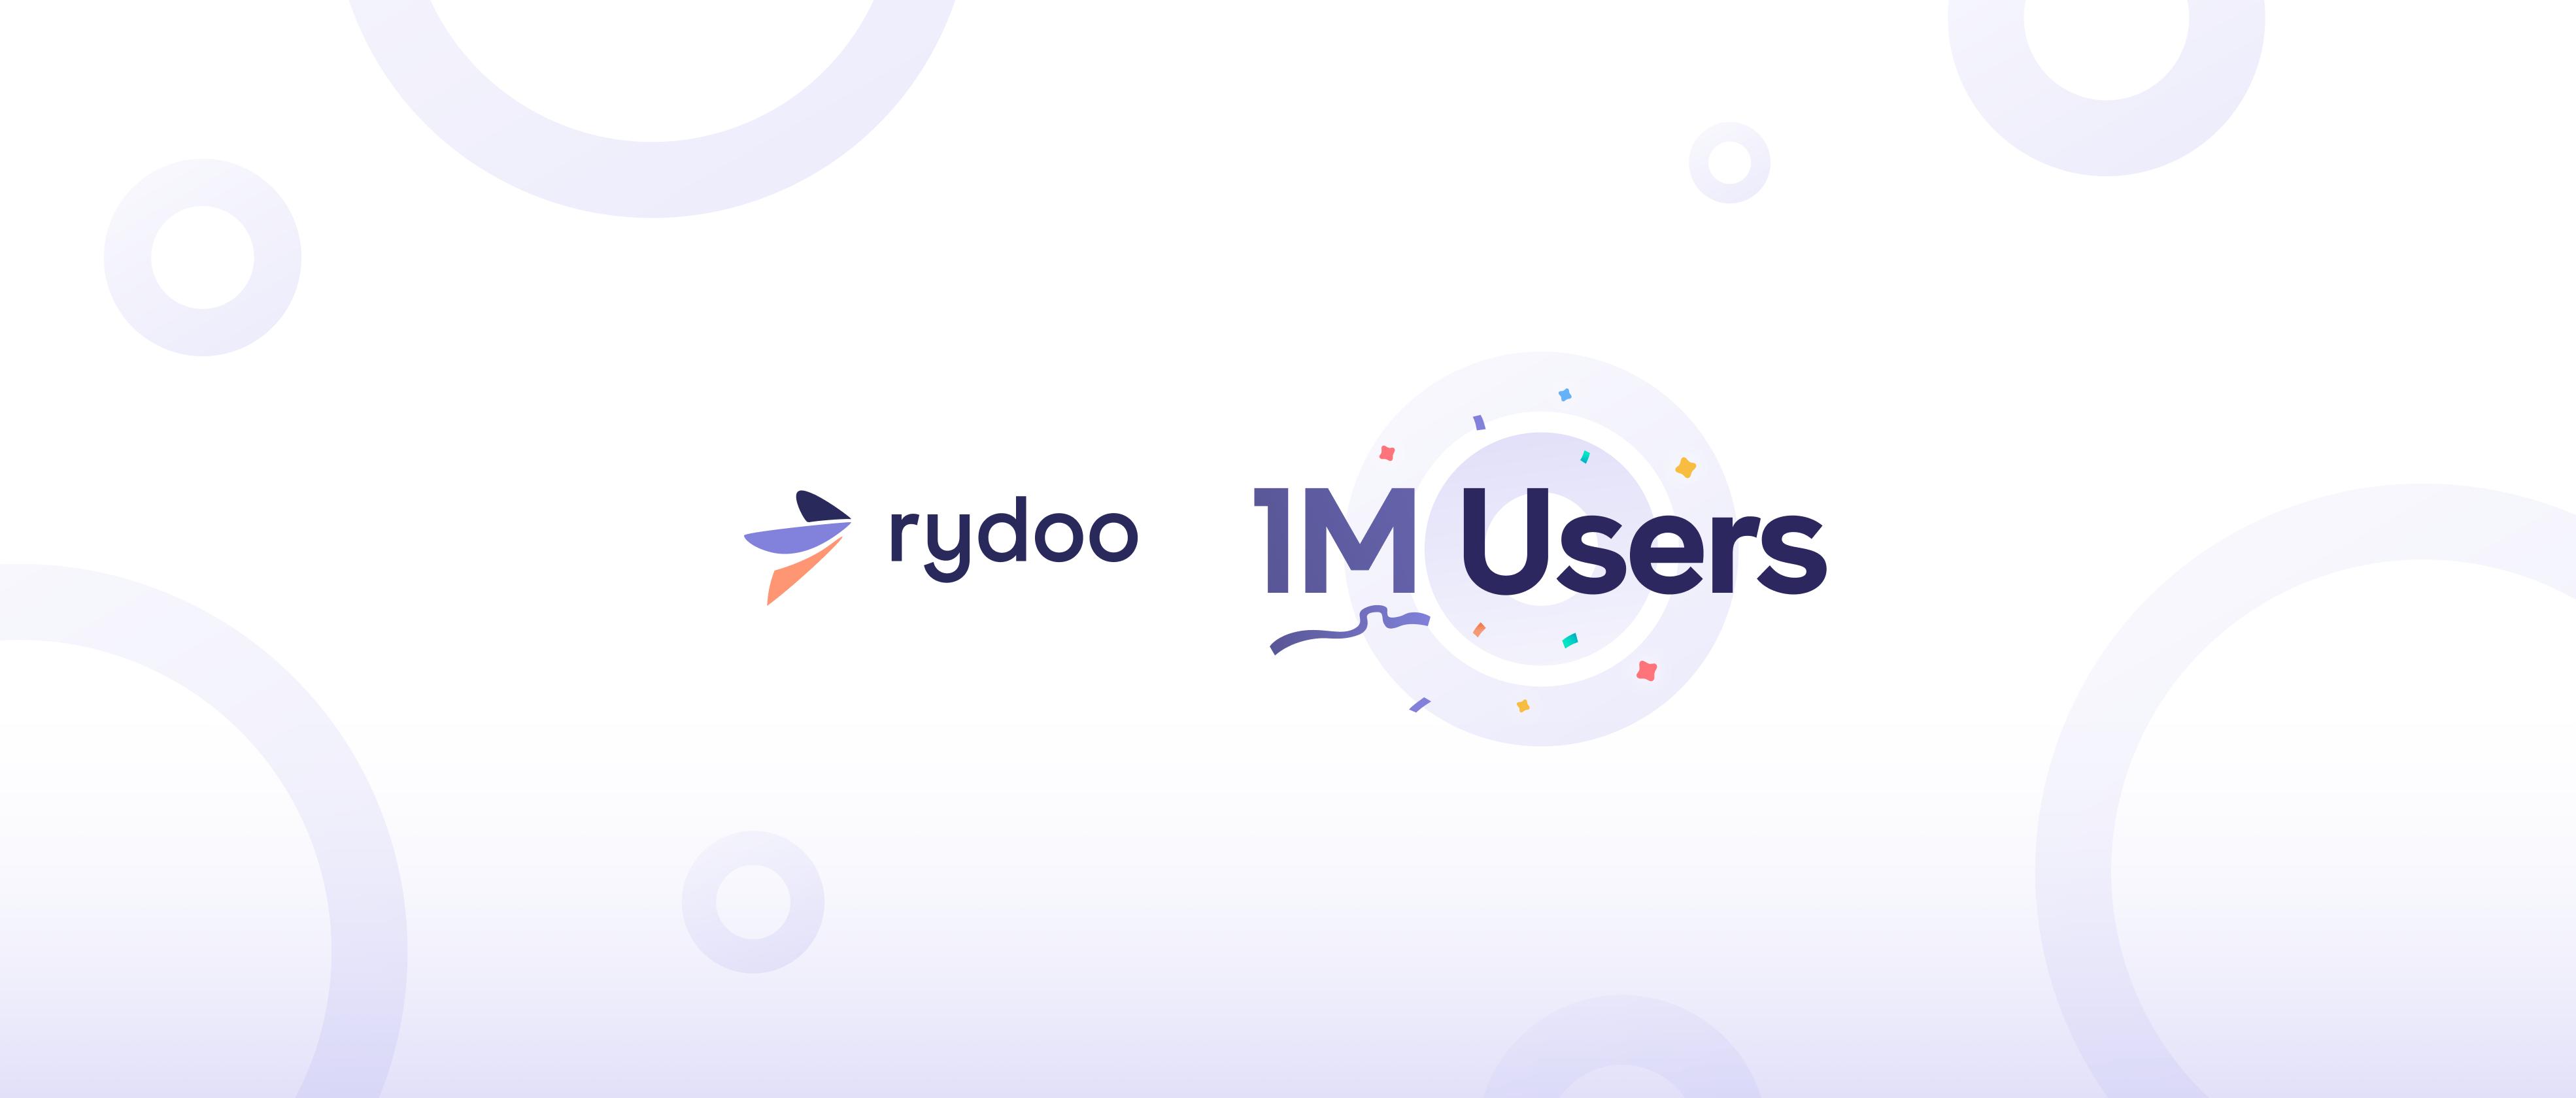 1 Million Users Rydoo